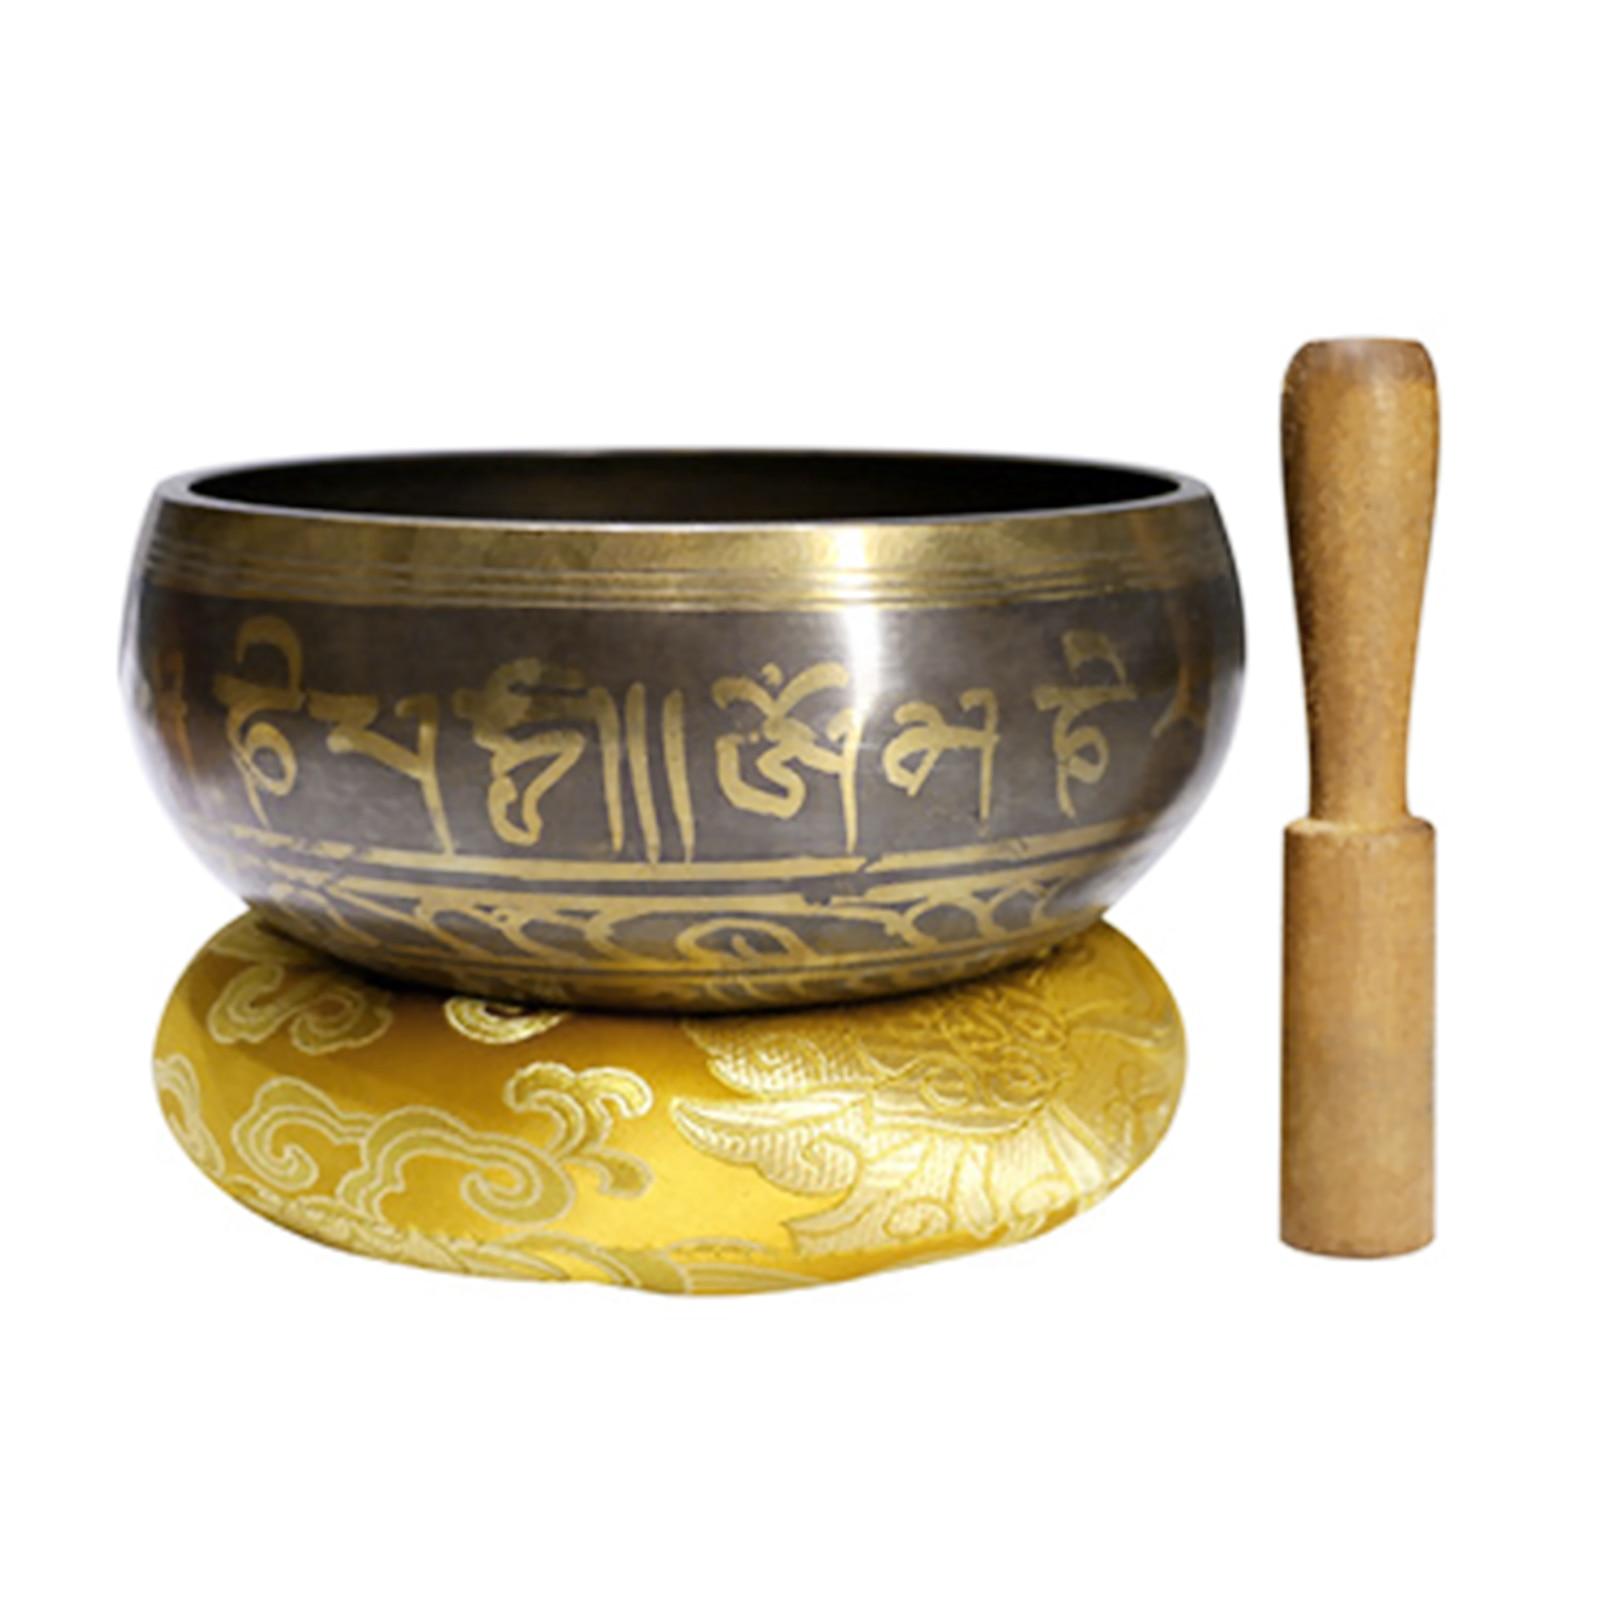 Mindfulness-Buddhist-Meditation-Tibetan-Singing-Bowl-Set-Gift-Calming-Easy-Play-Chanting-Yoga-With-Cushion-Stick.jpg